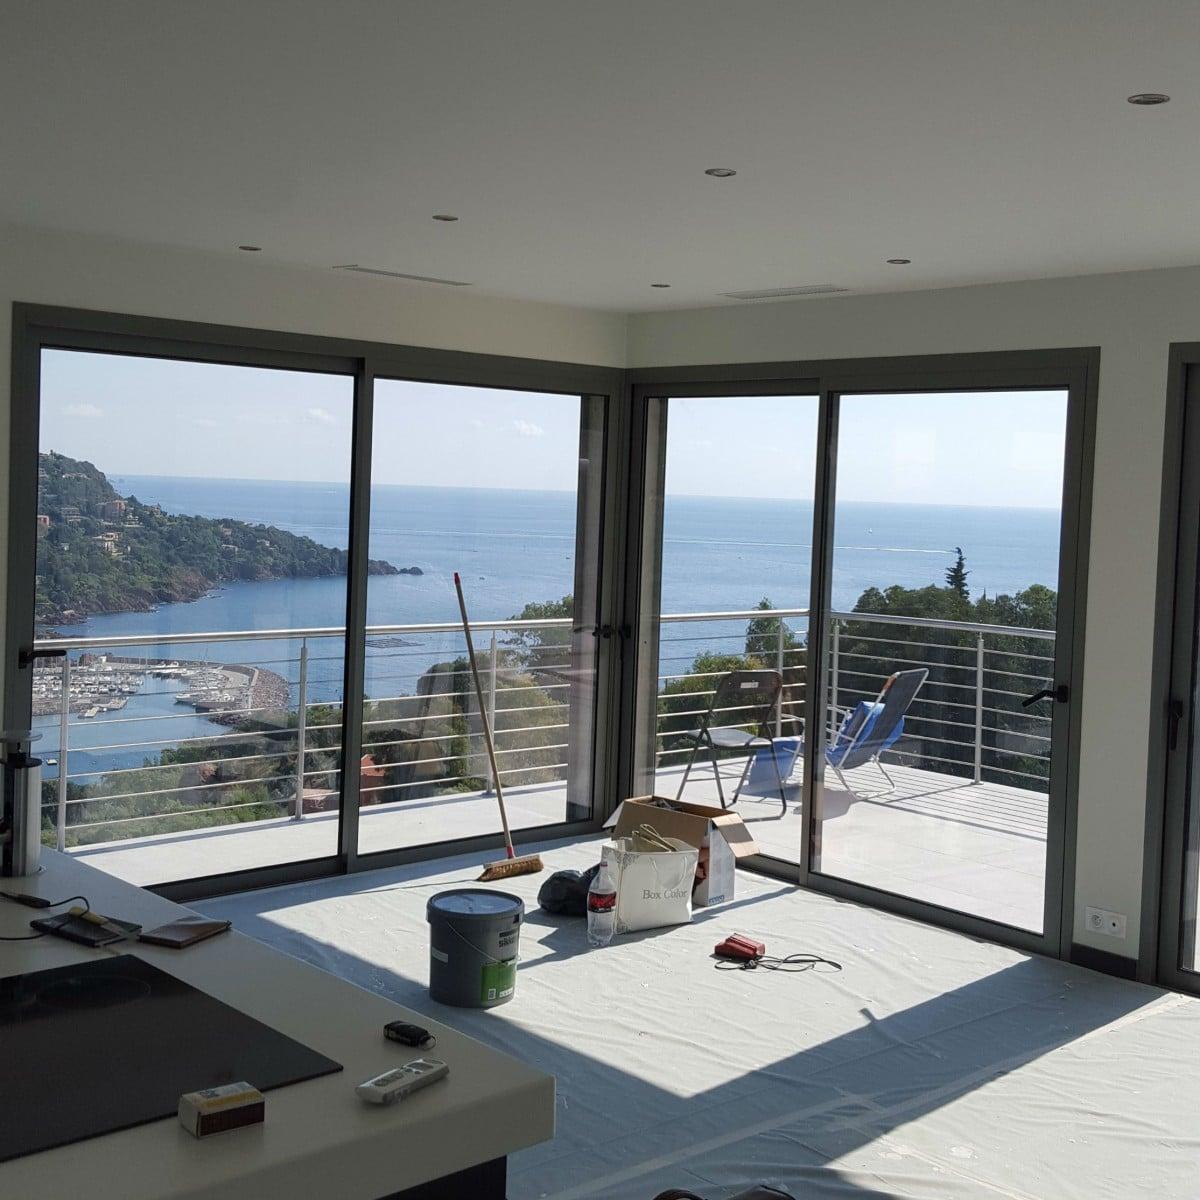 installation d 39 un gainable climatisation r versible. Black Bedroom Furniture Sets. Home Design Ideas